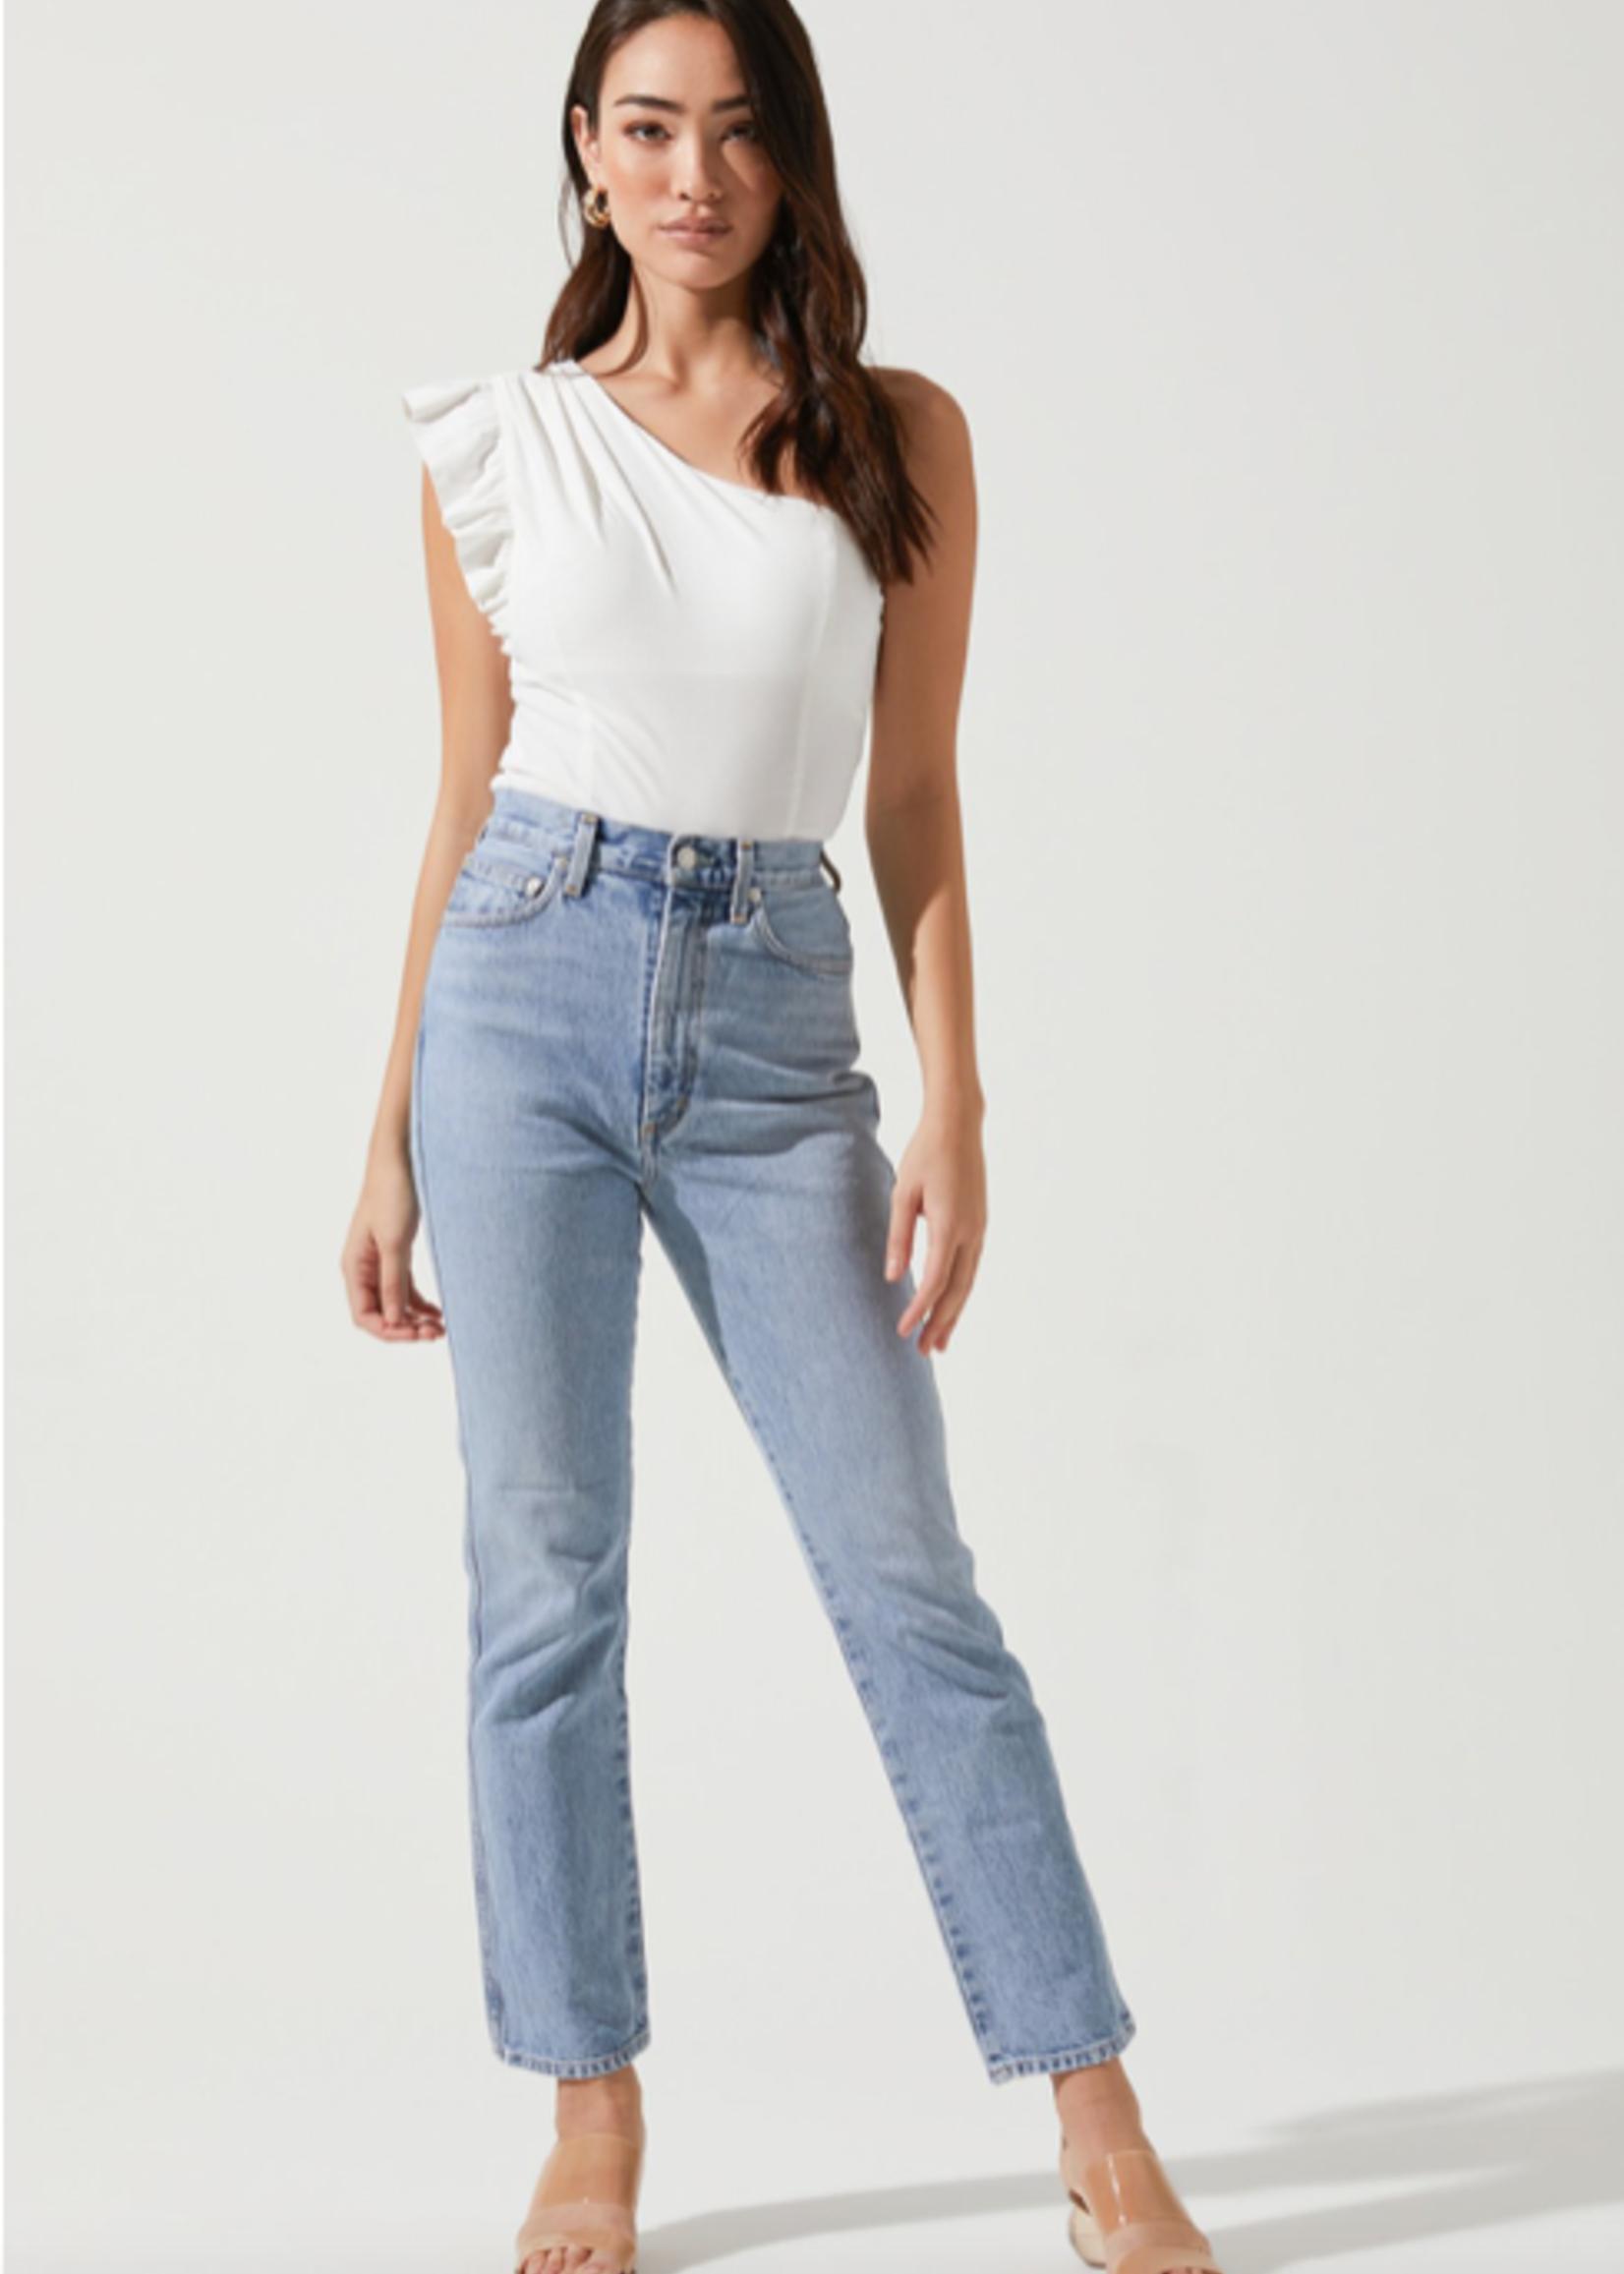 Elitaire Boutique Sweet Summer Bodysuit White